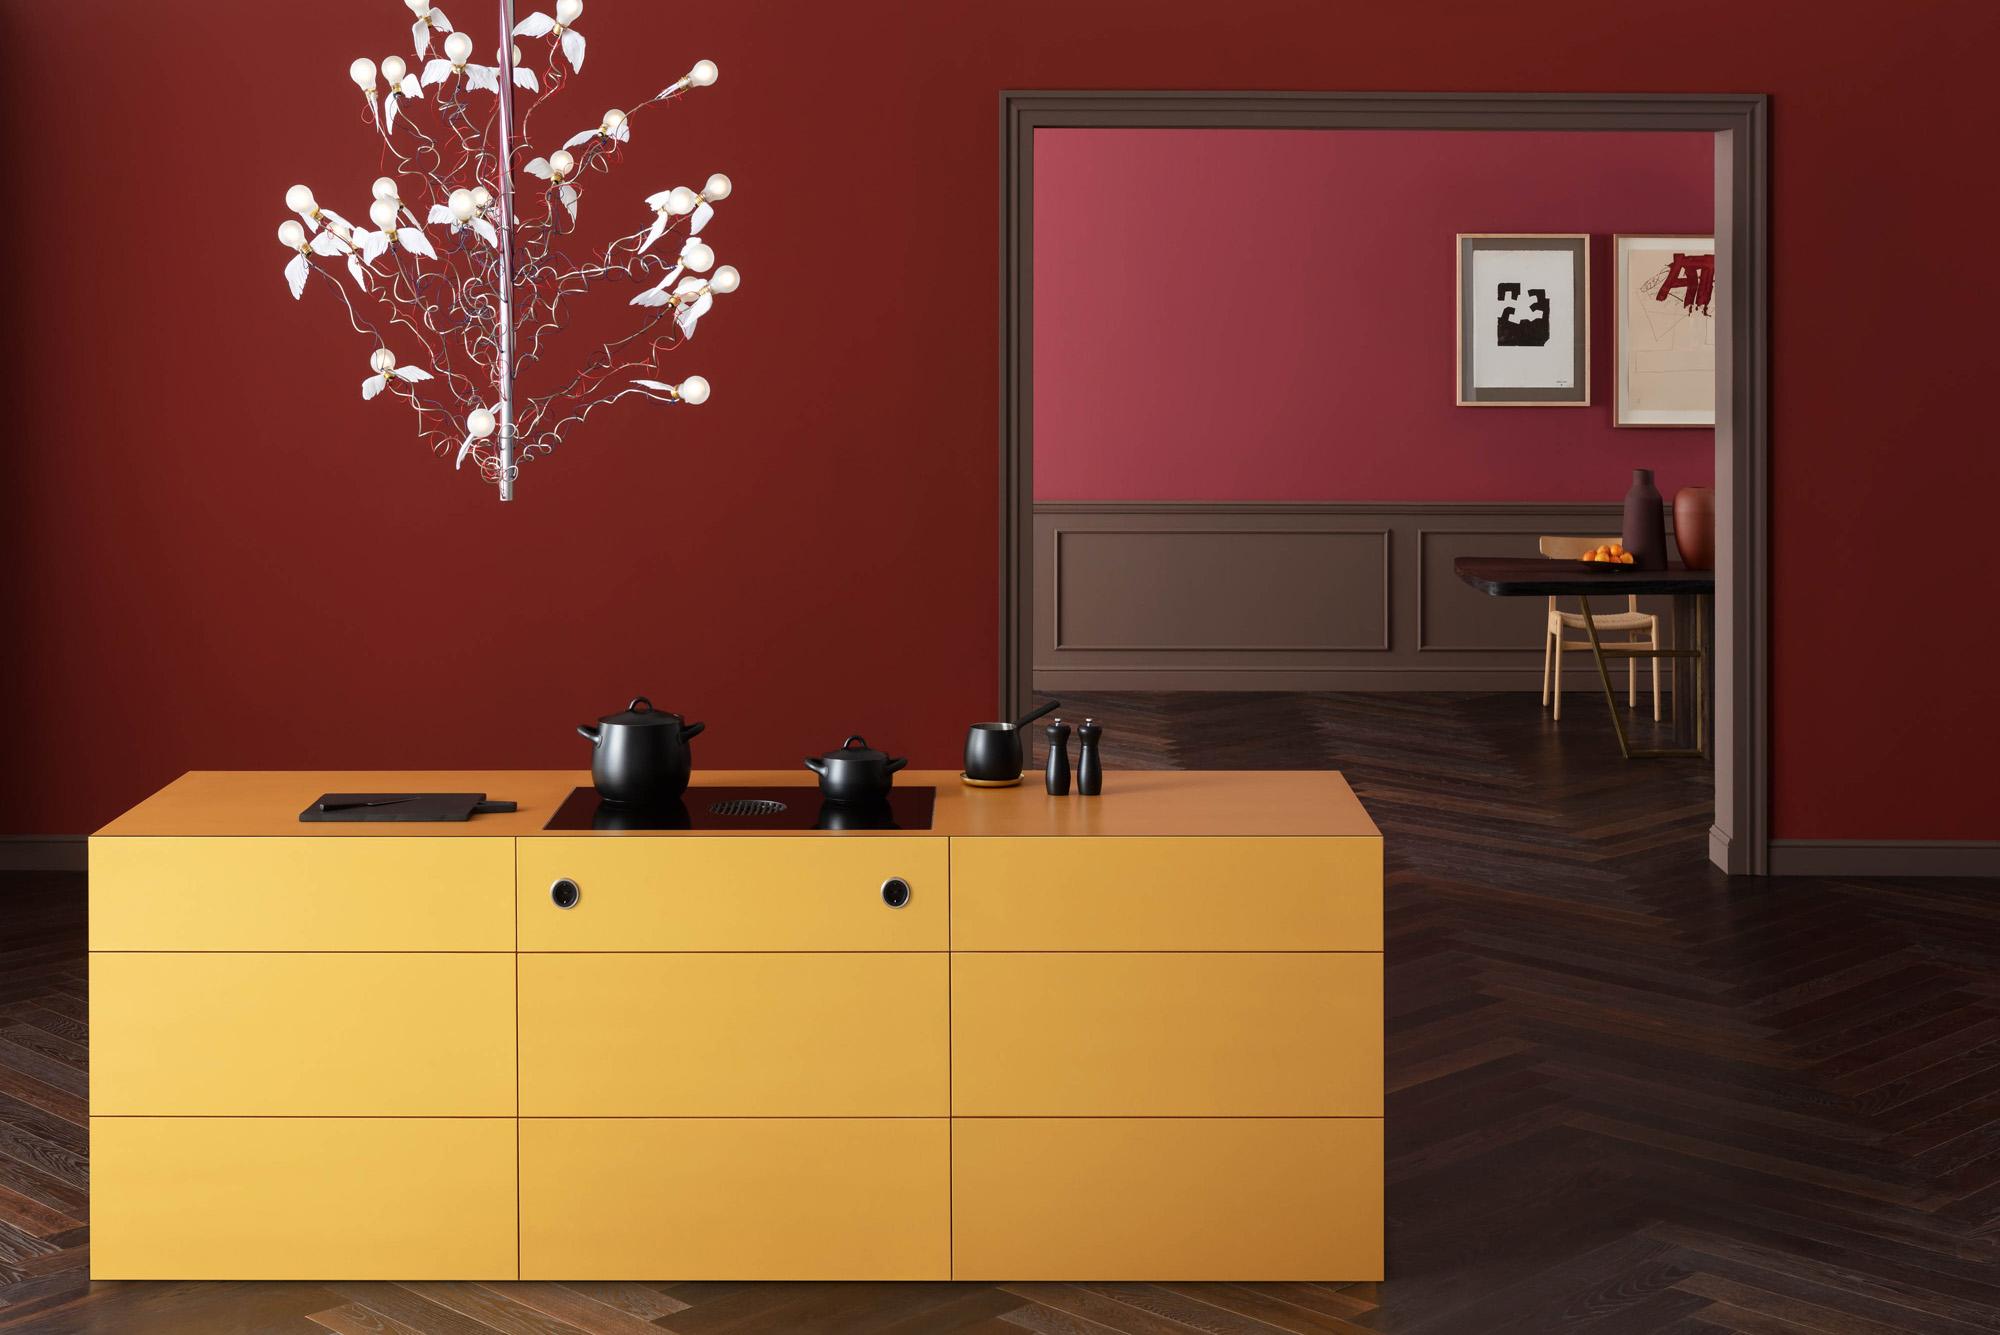 Bora Hob in yellow valchromat kitchen